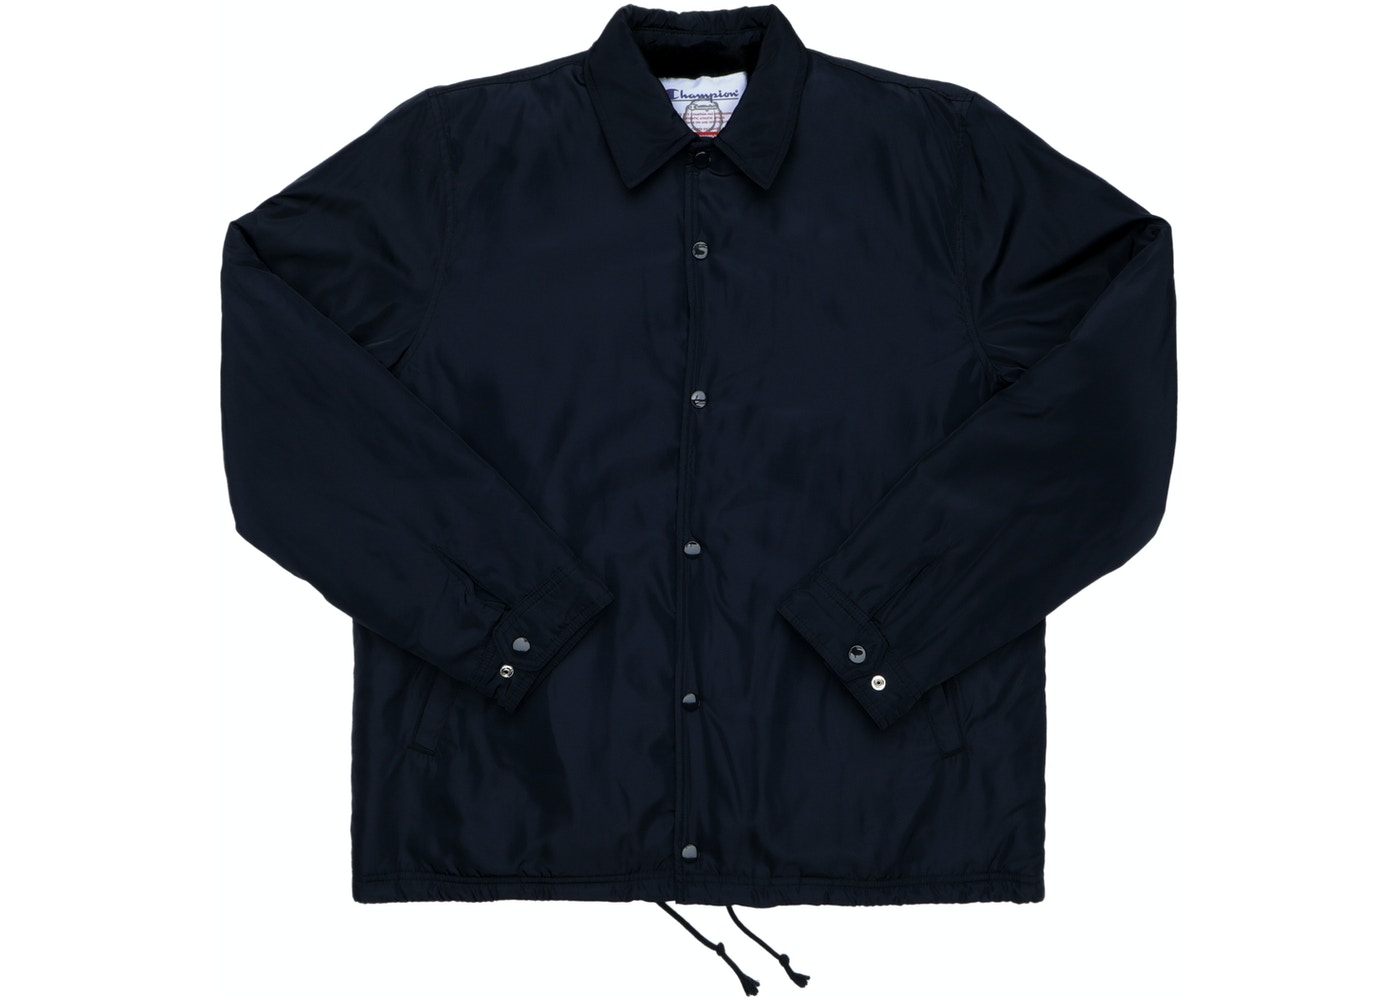 Supreme Champion Label Coaches Jacket